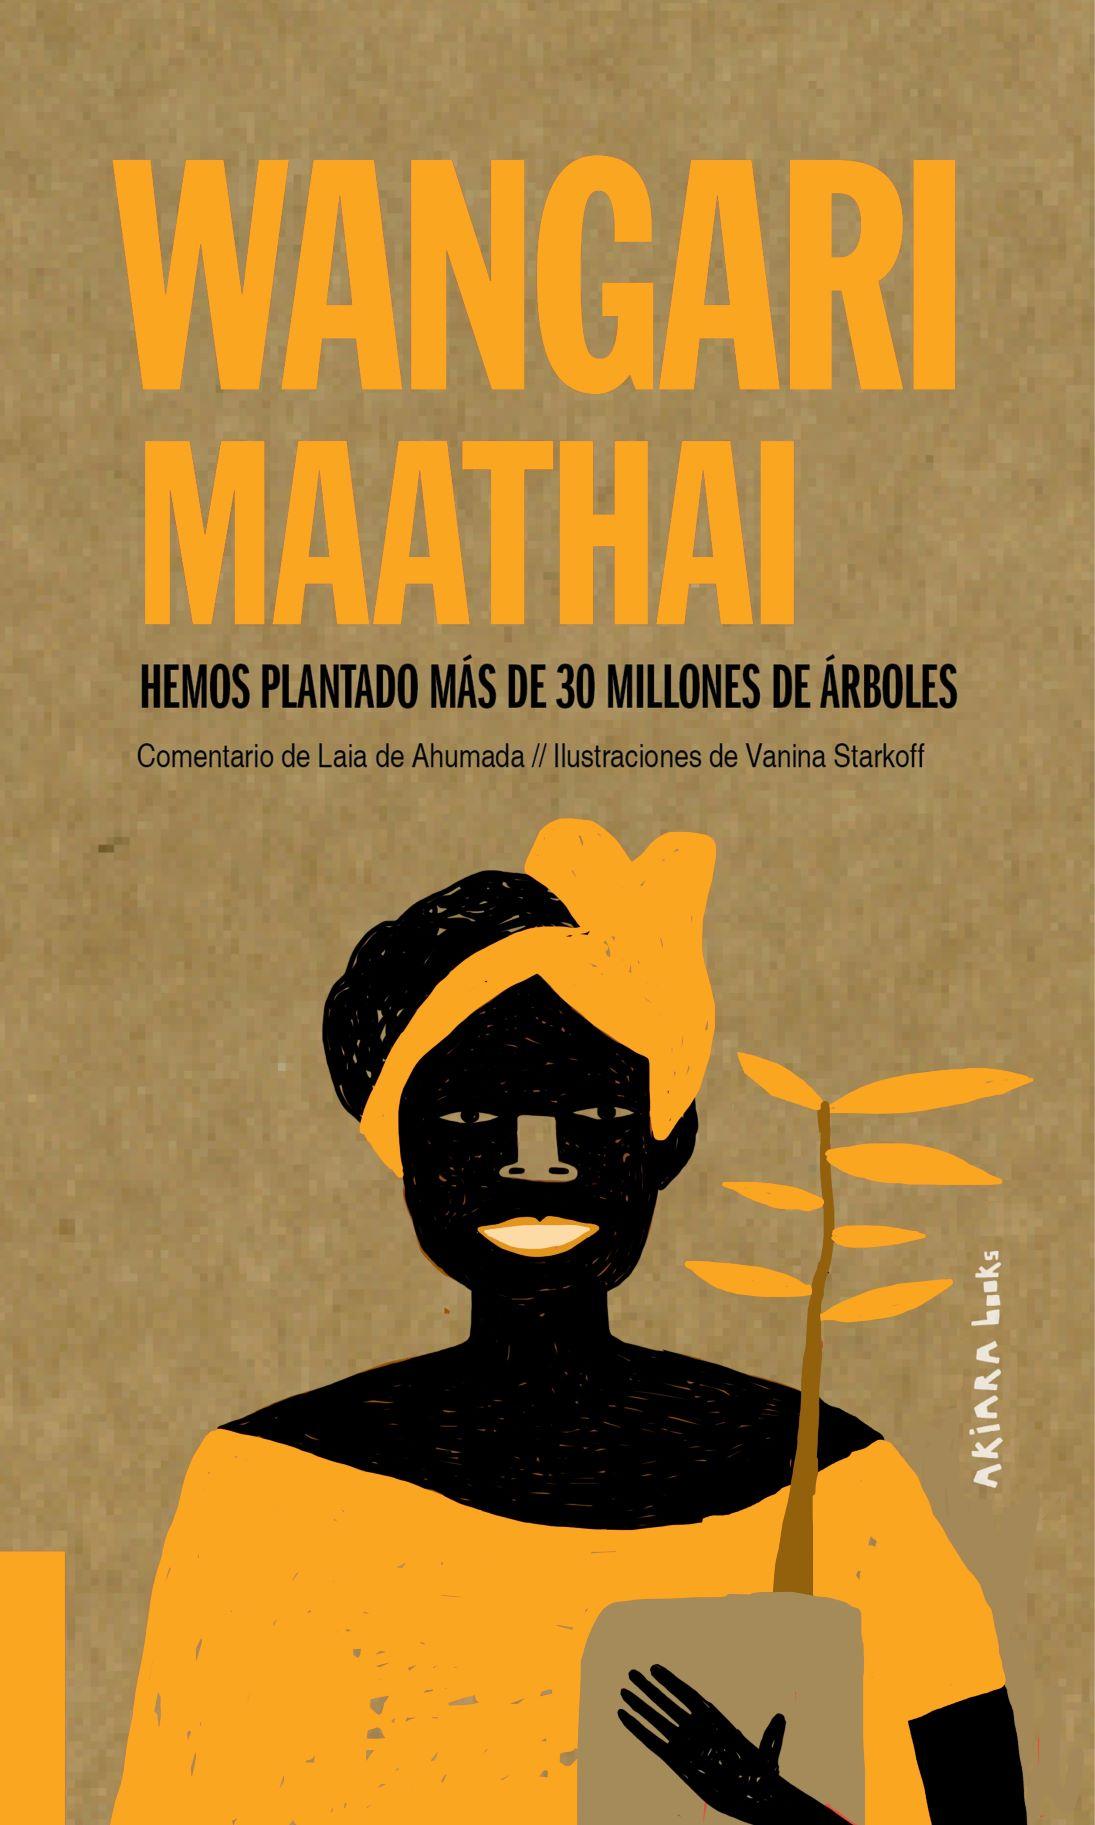 Wangari Maathai akiparla final cover sept. 2020